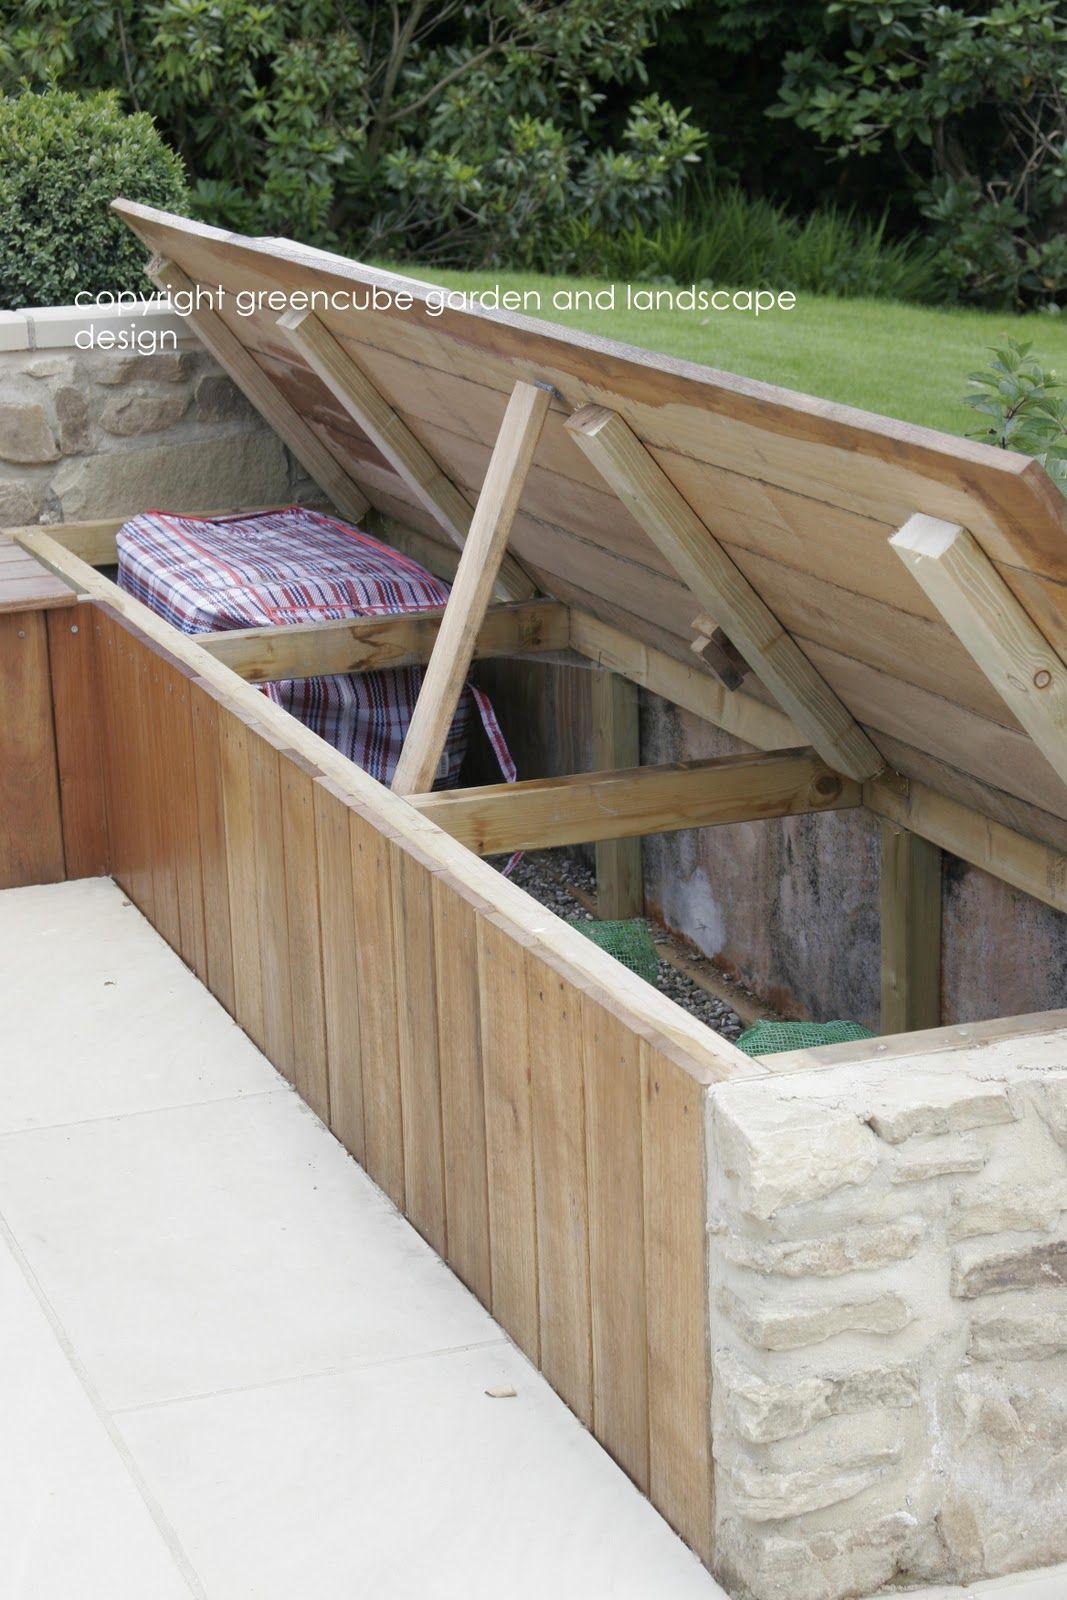 Greencube Garden And Landscape Design Uk Practical